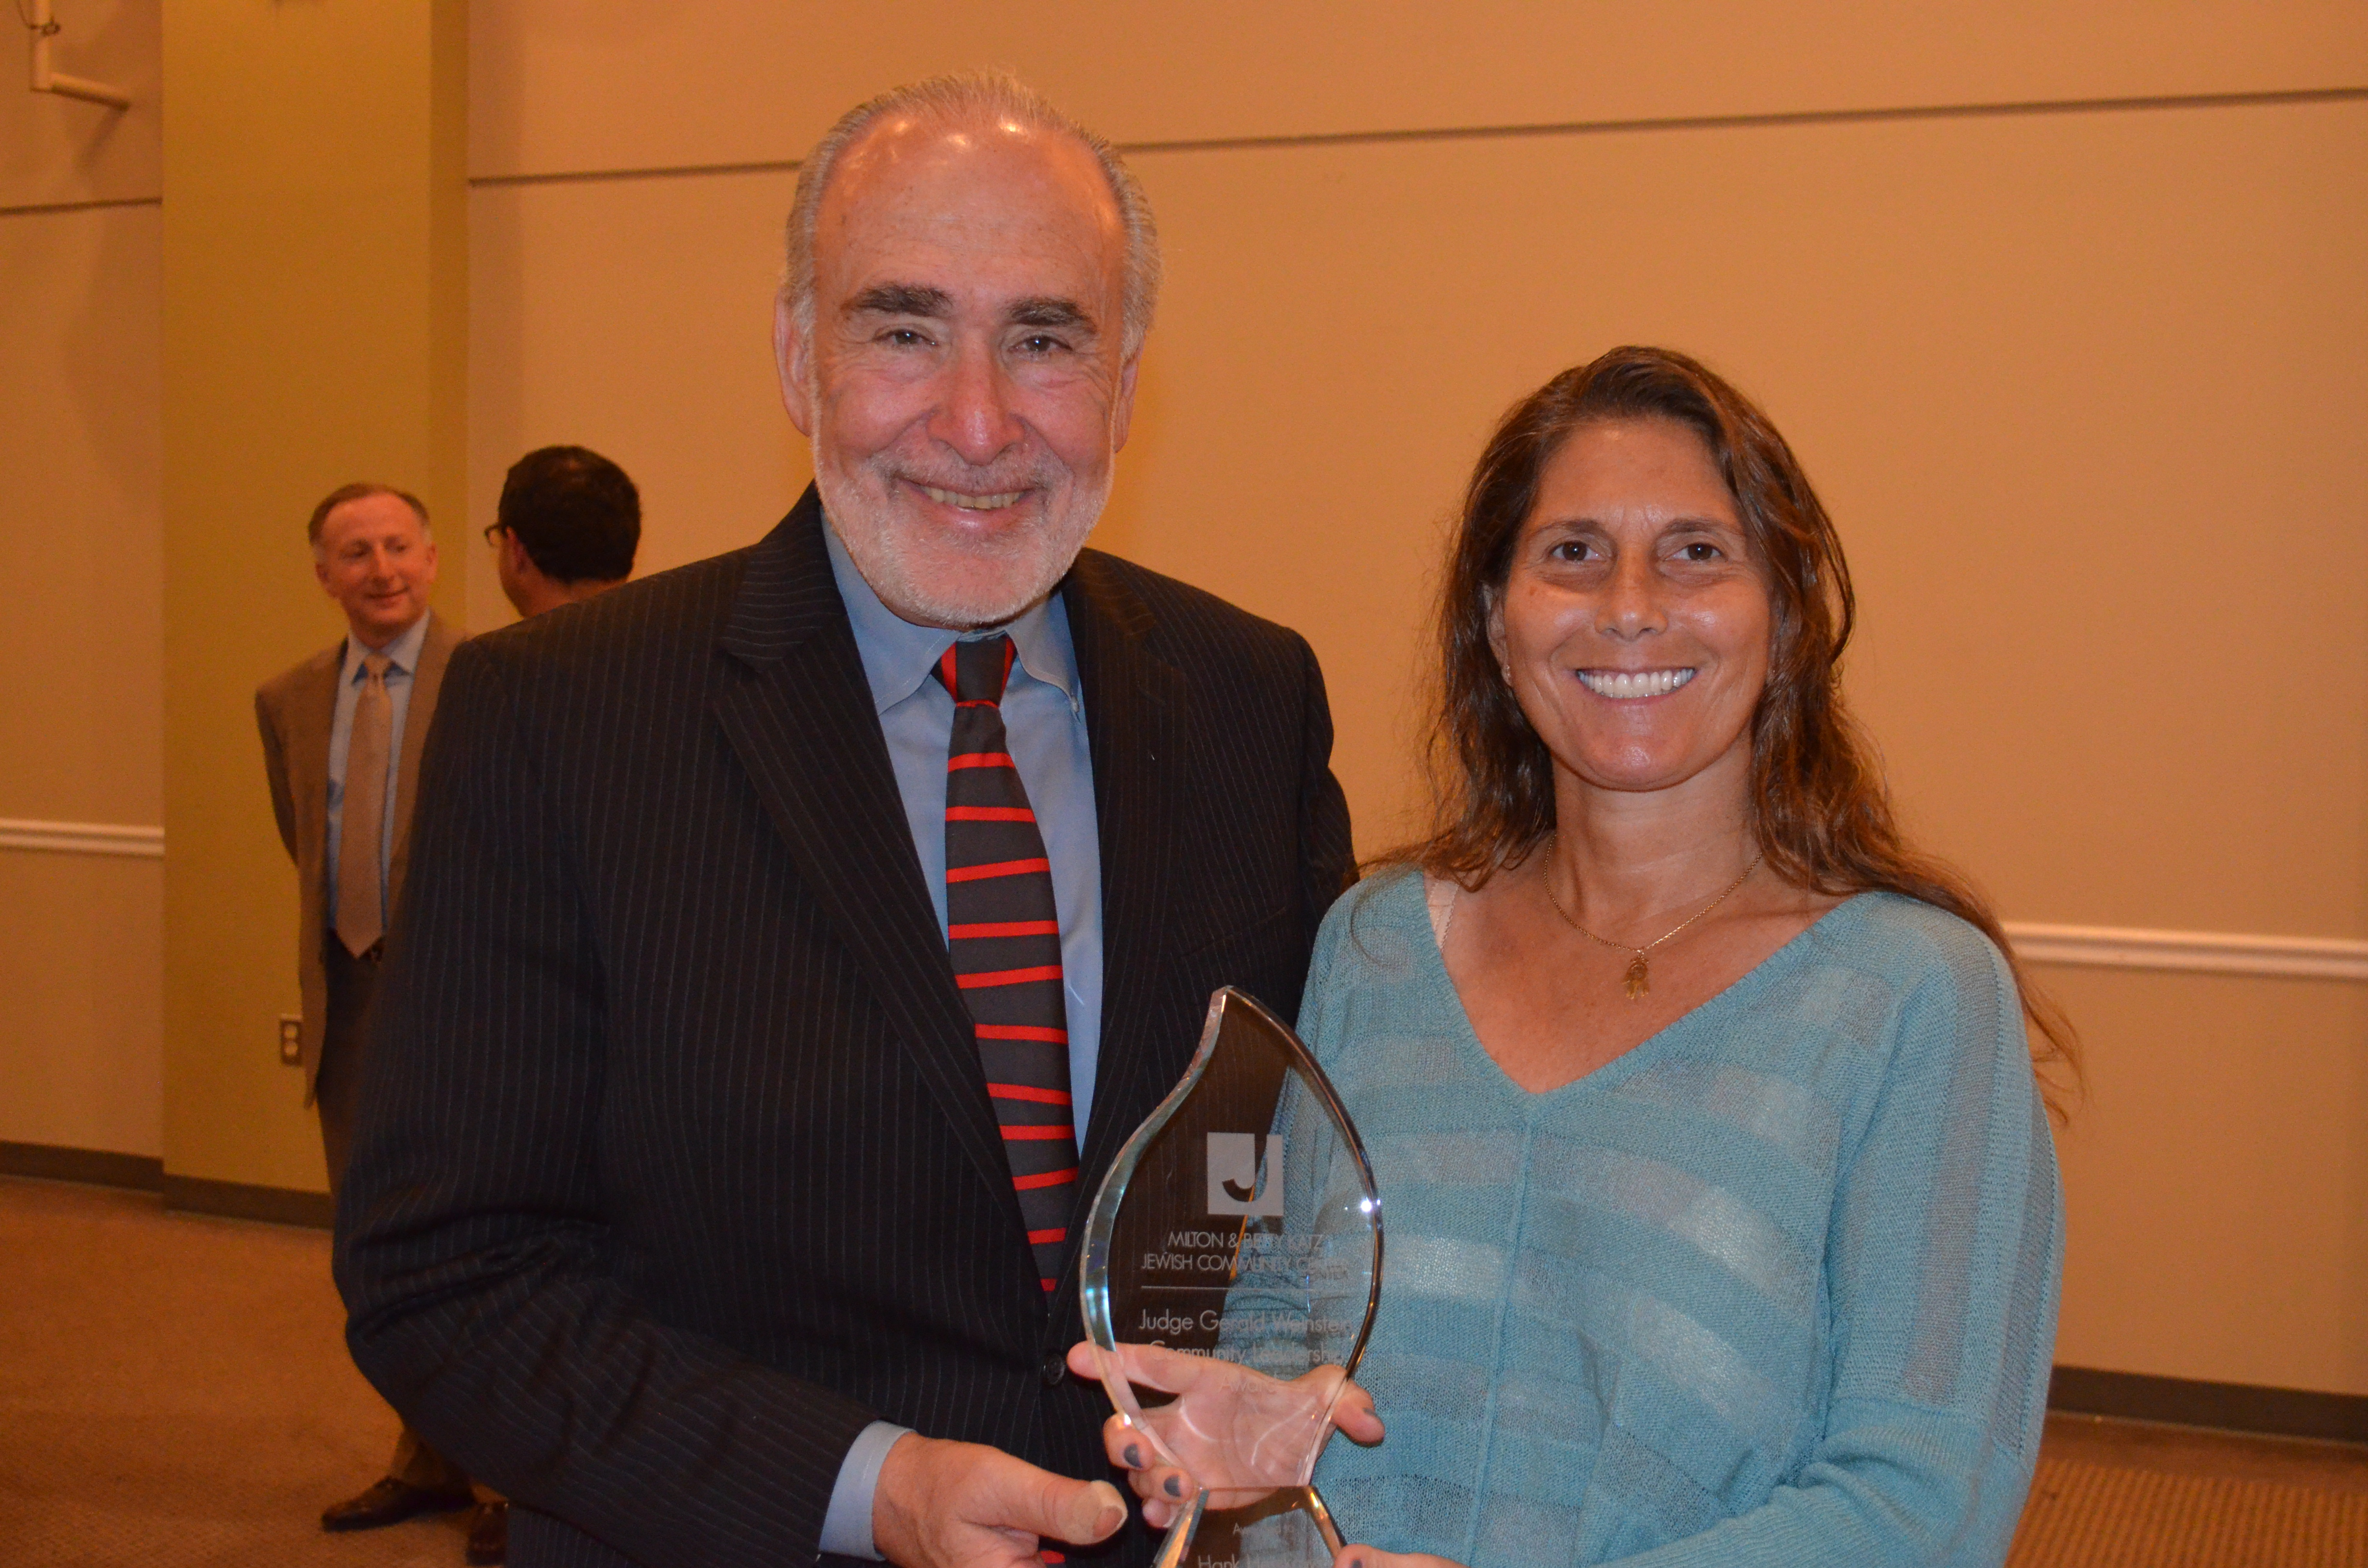 Katz JCC CEO Jack I. Fox with Renee Herskowitz accepting the Judge Gerald Weinstein Community Leadership award on behalf of her father Hank.